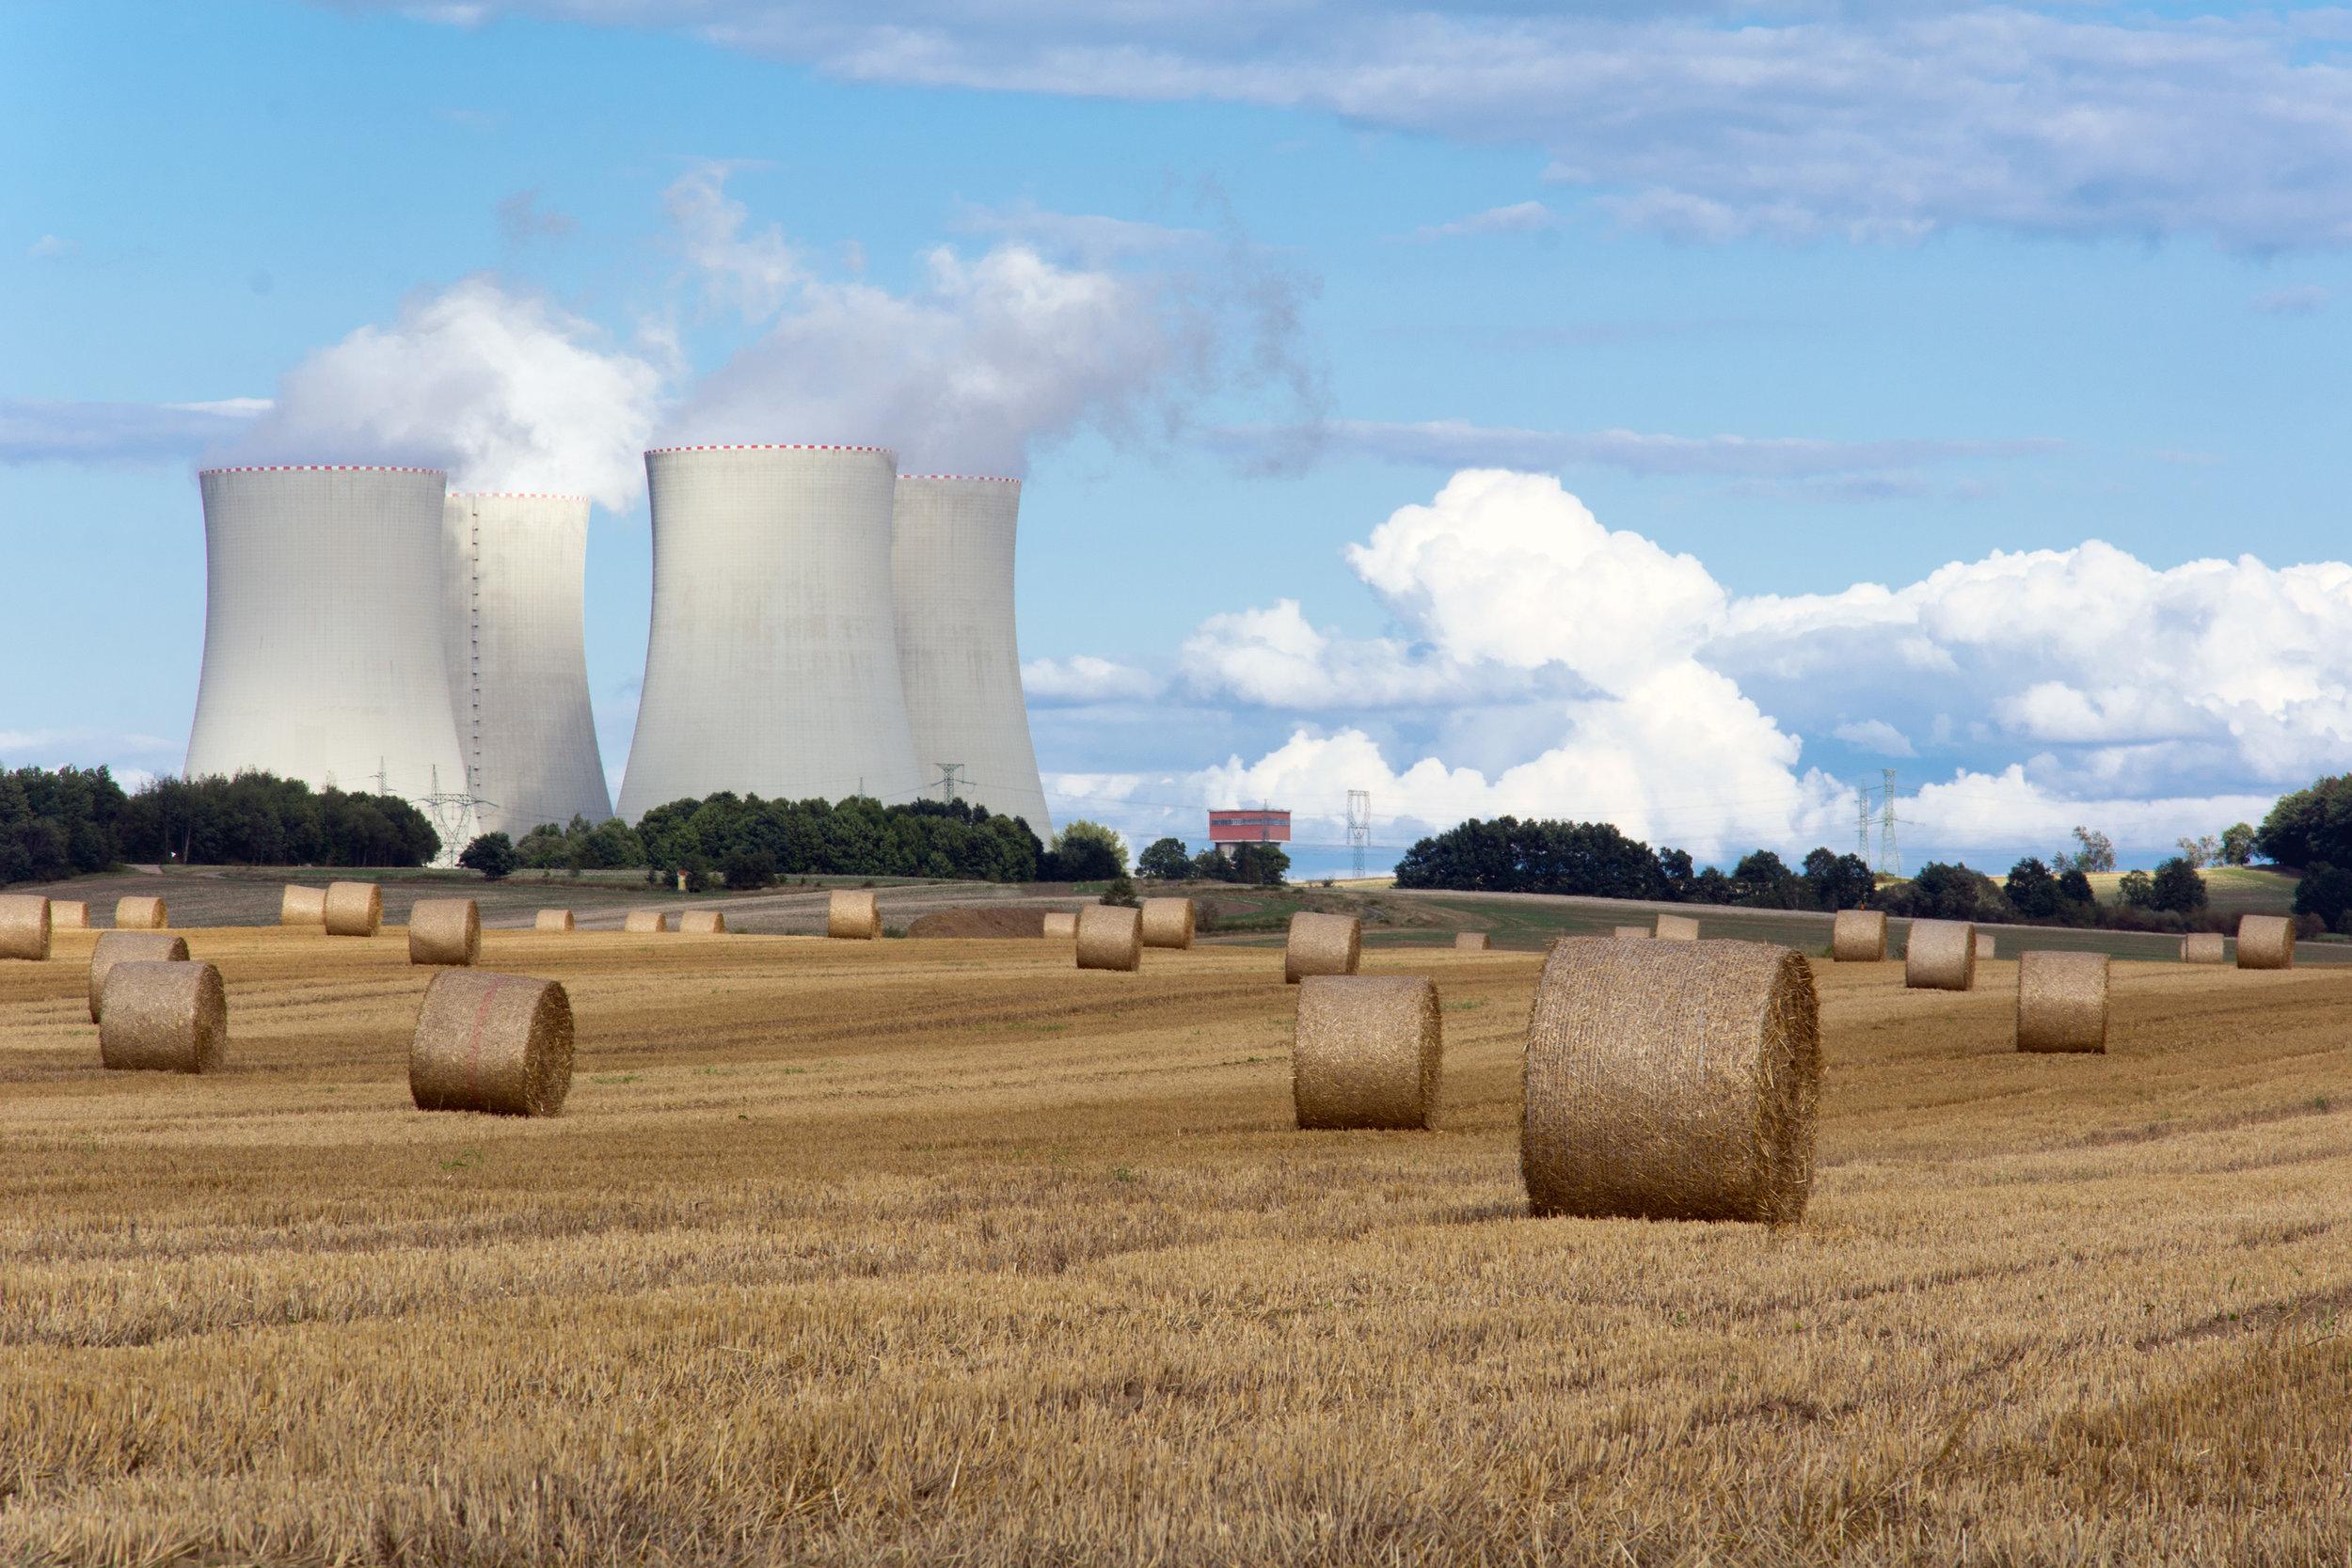 nuclear-power-plant-between-fields.jpg